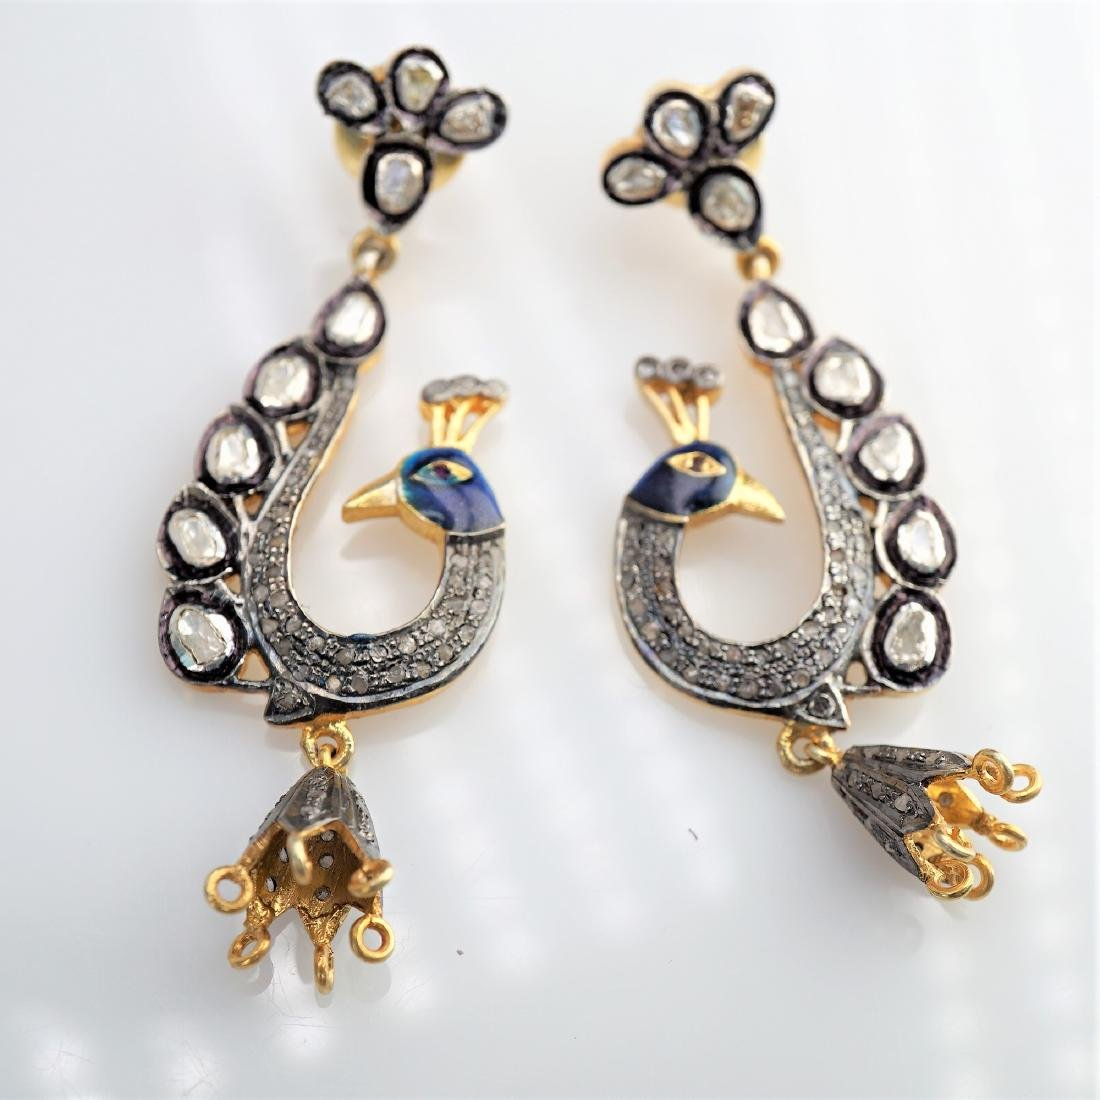 3.80 CTTW Peacock Earring Set